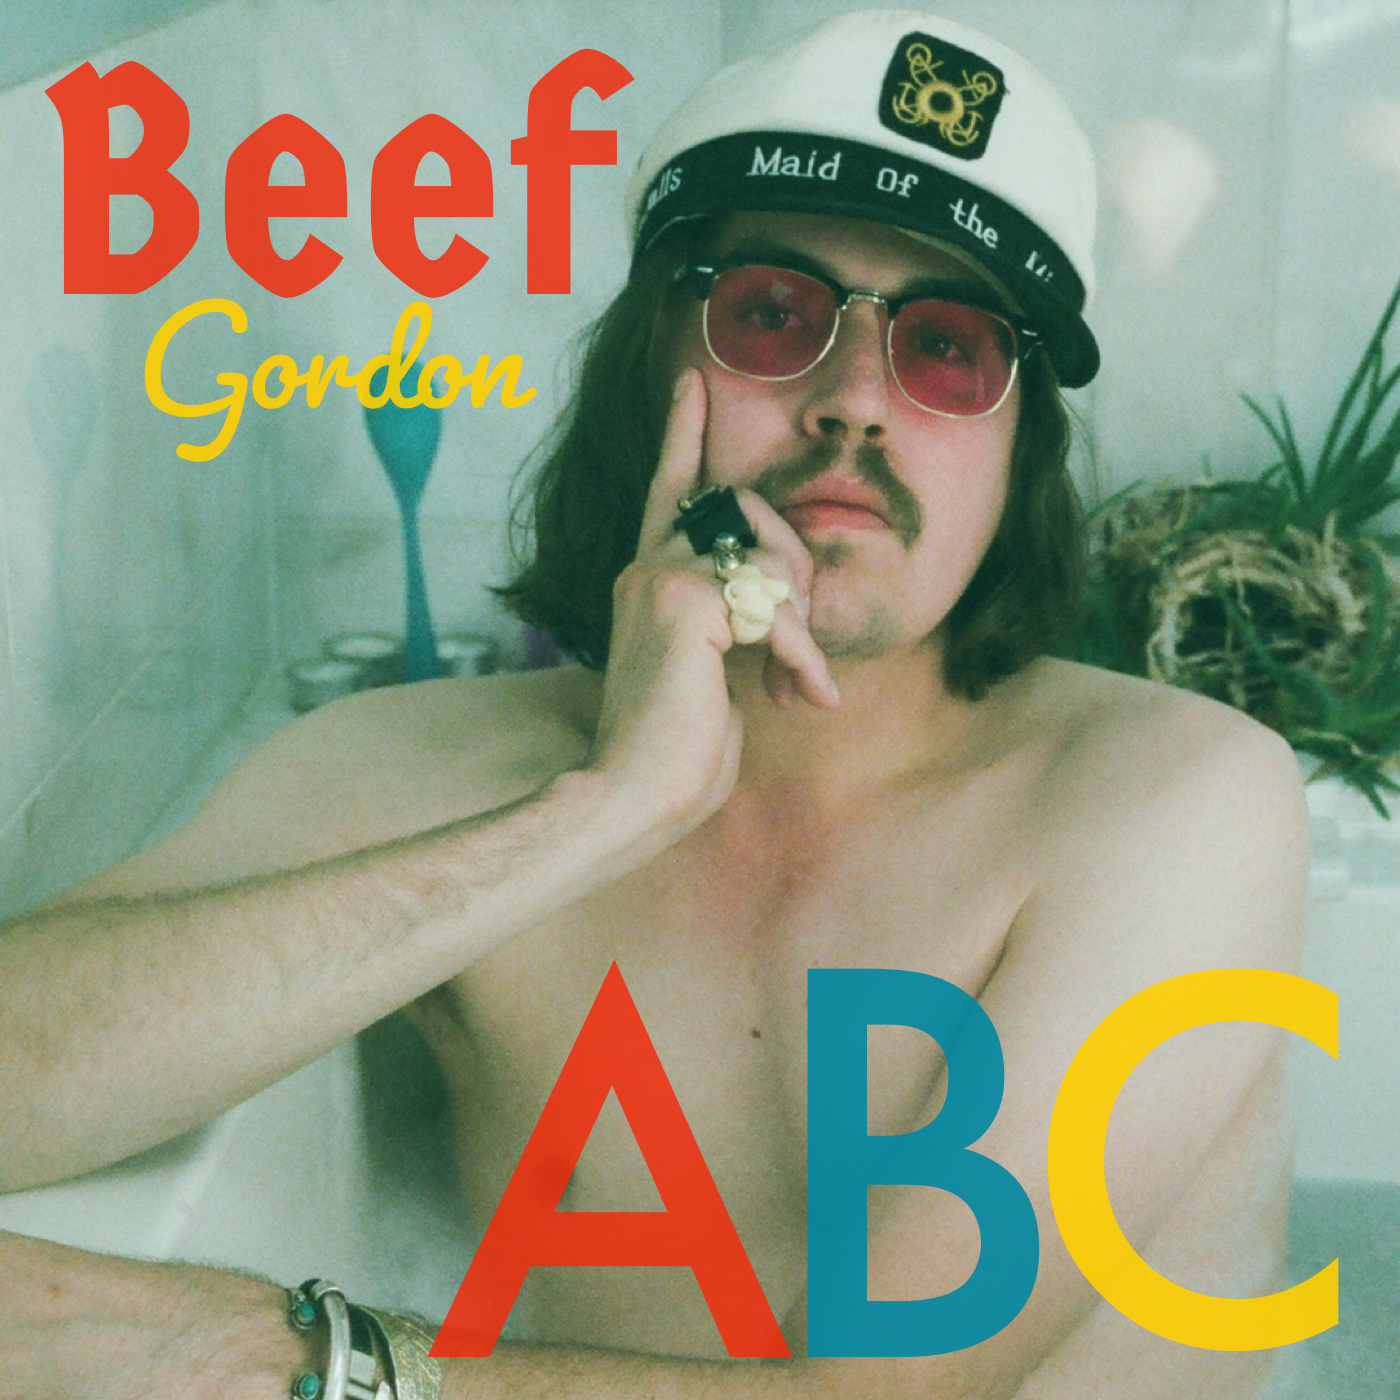 "Beef Gordon Whips Up New Single ""ABC"""